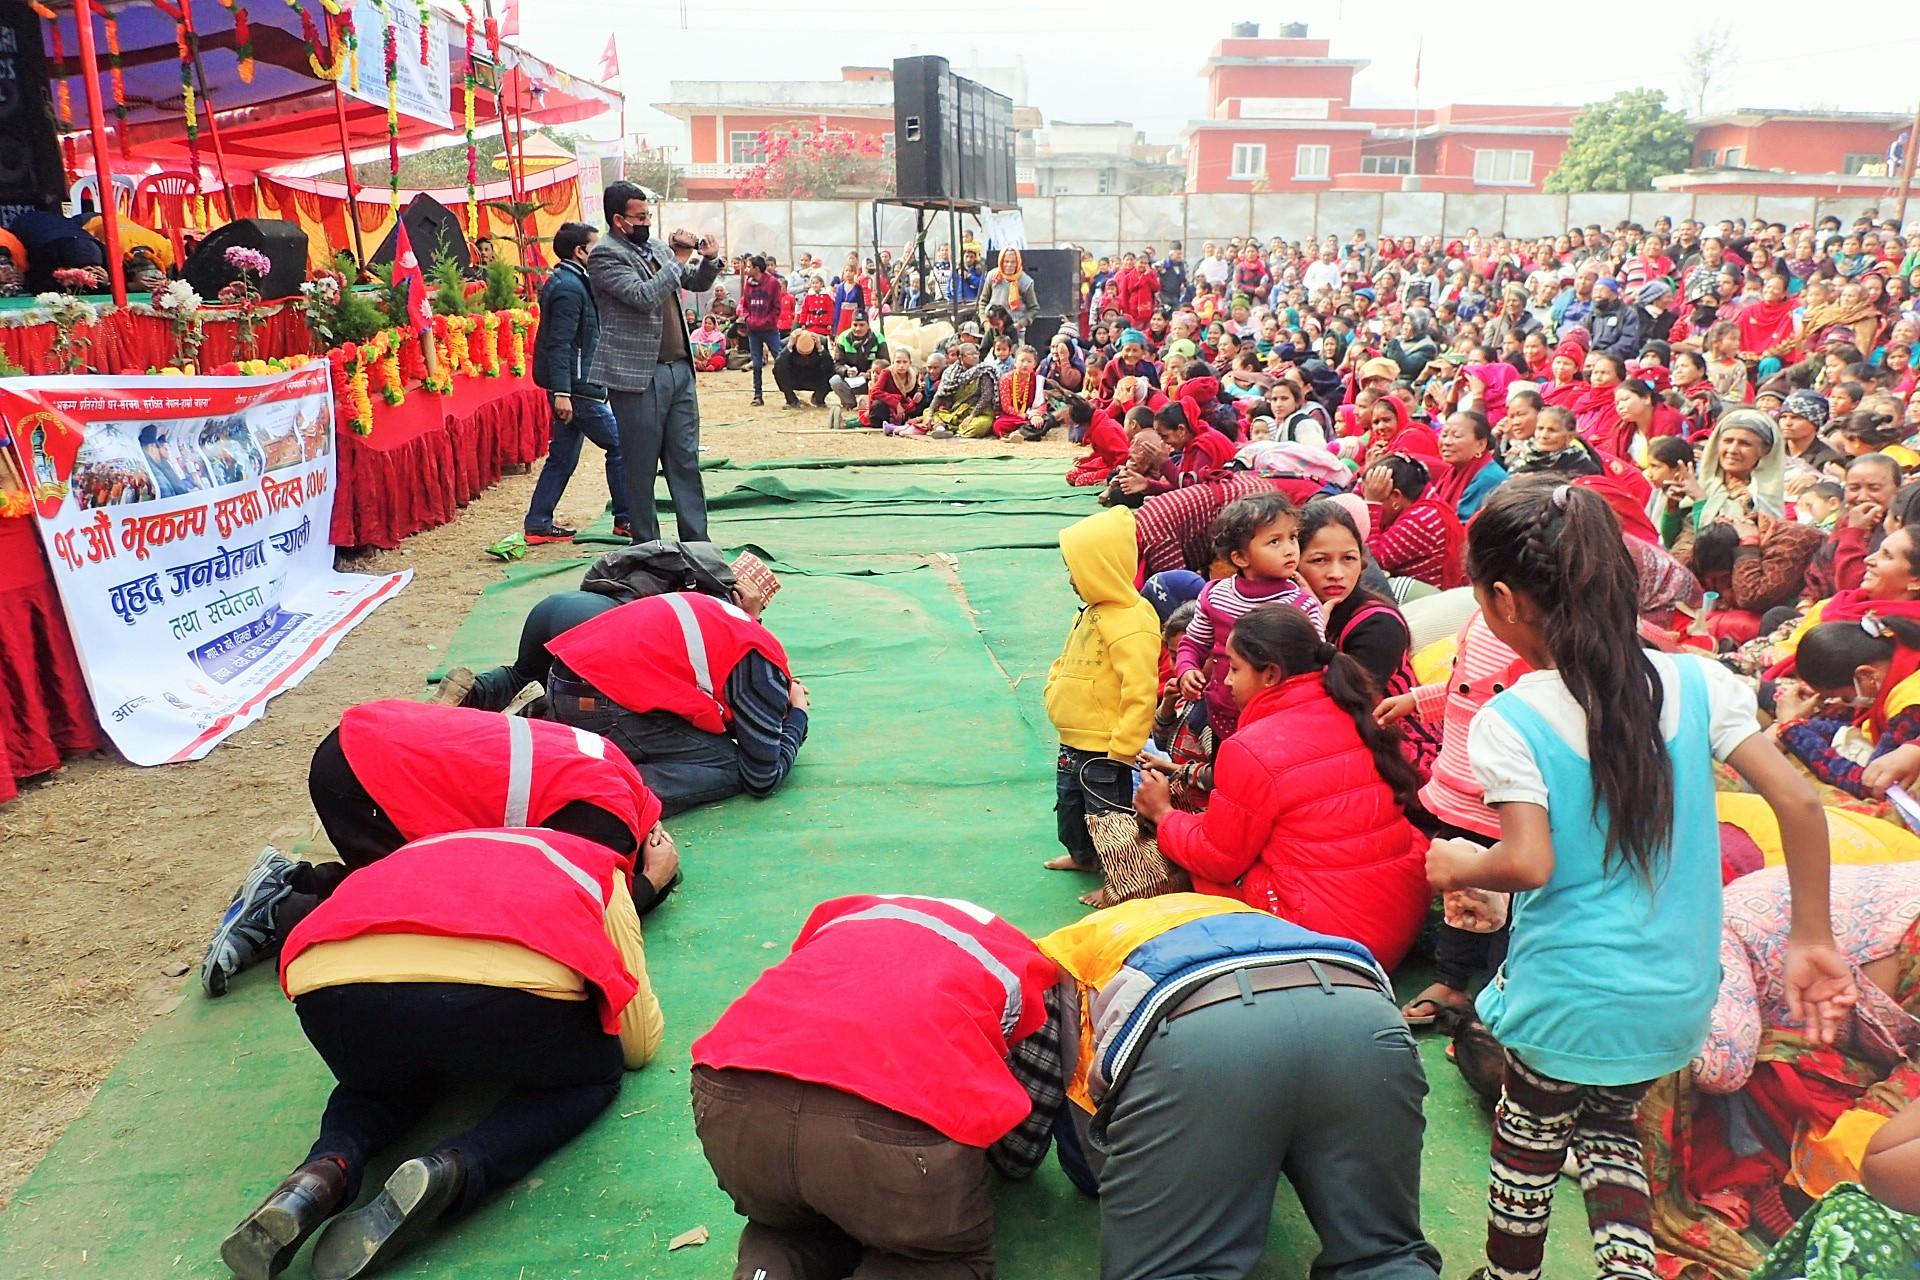 Earthquake demonstration